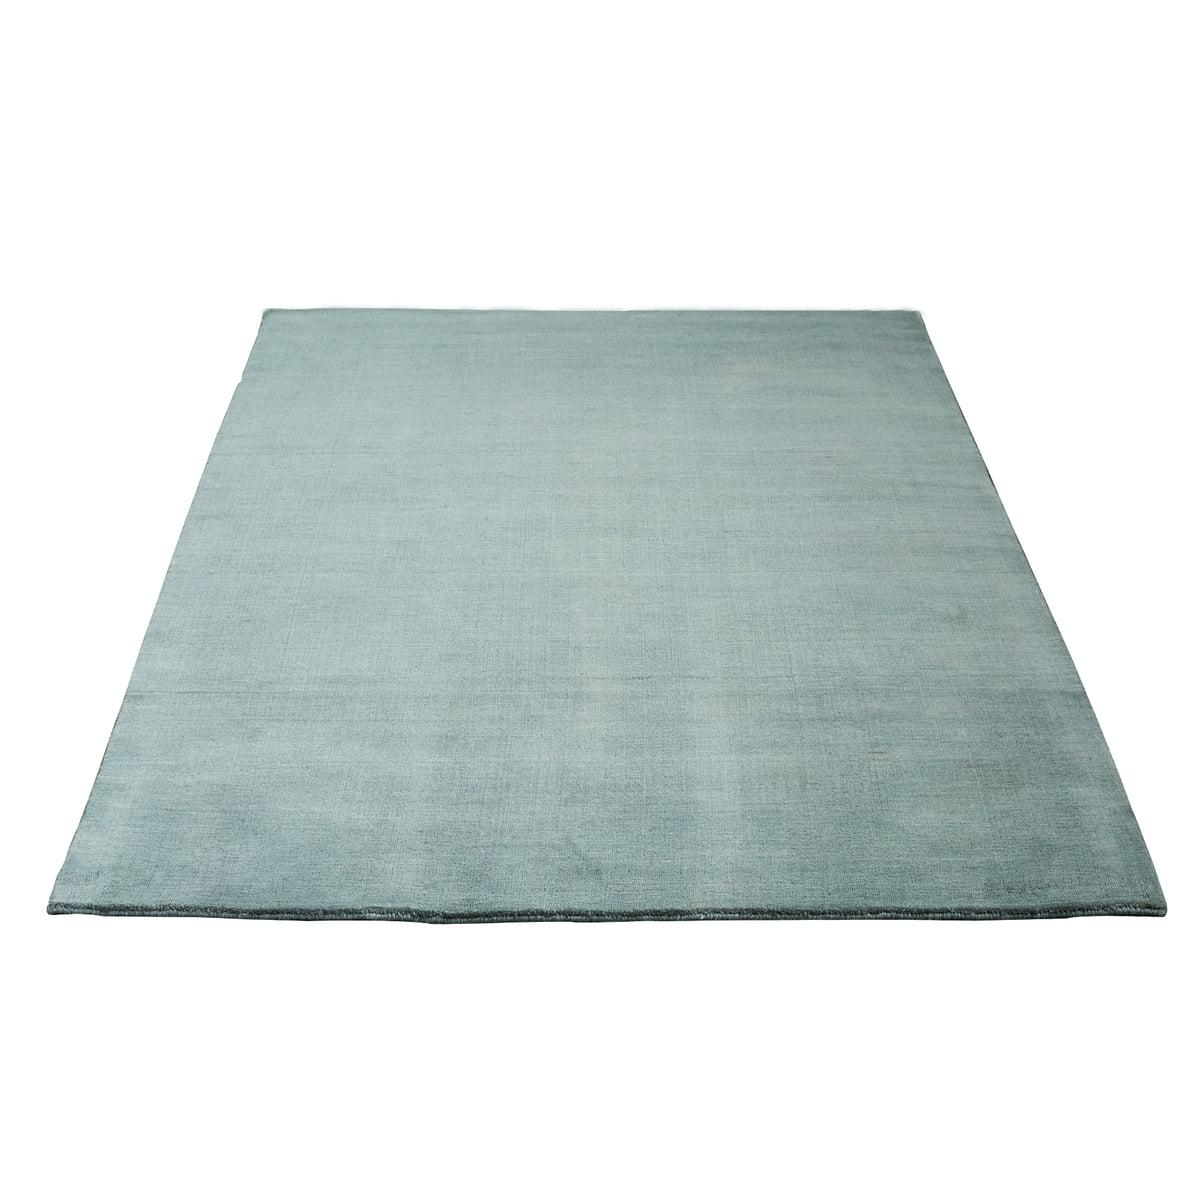 rug 200 x 300. massimo - earth rug 200 x 300 cm in verte grey o